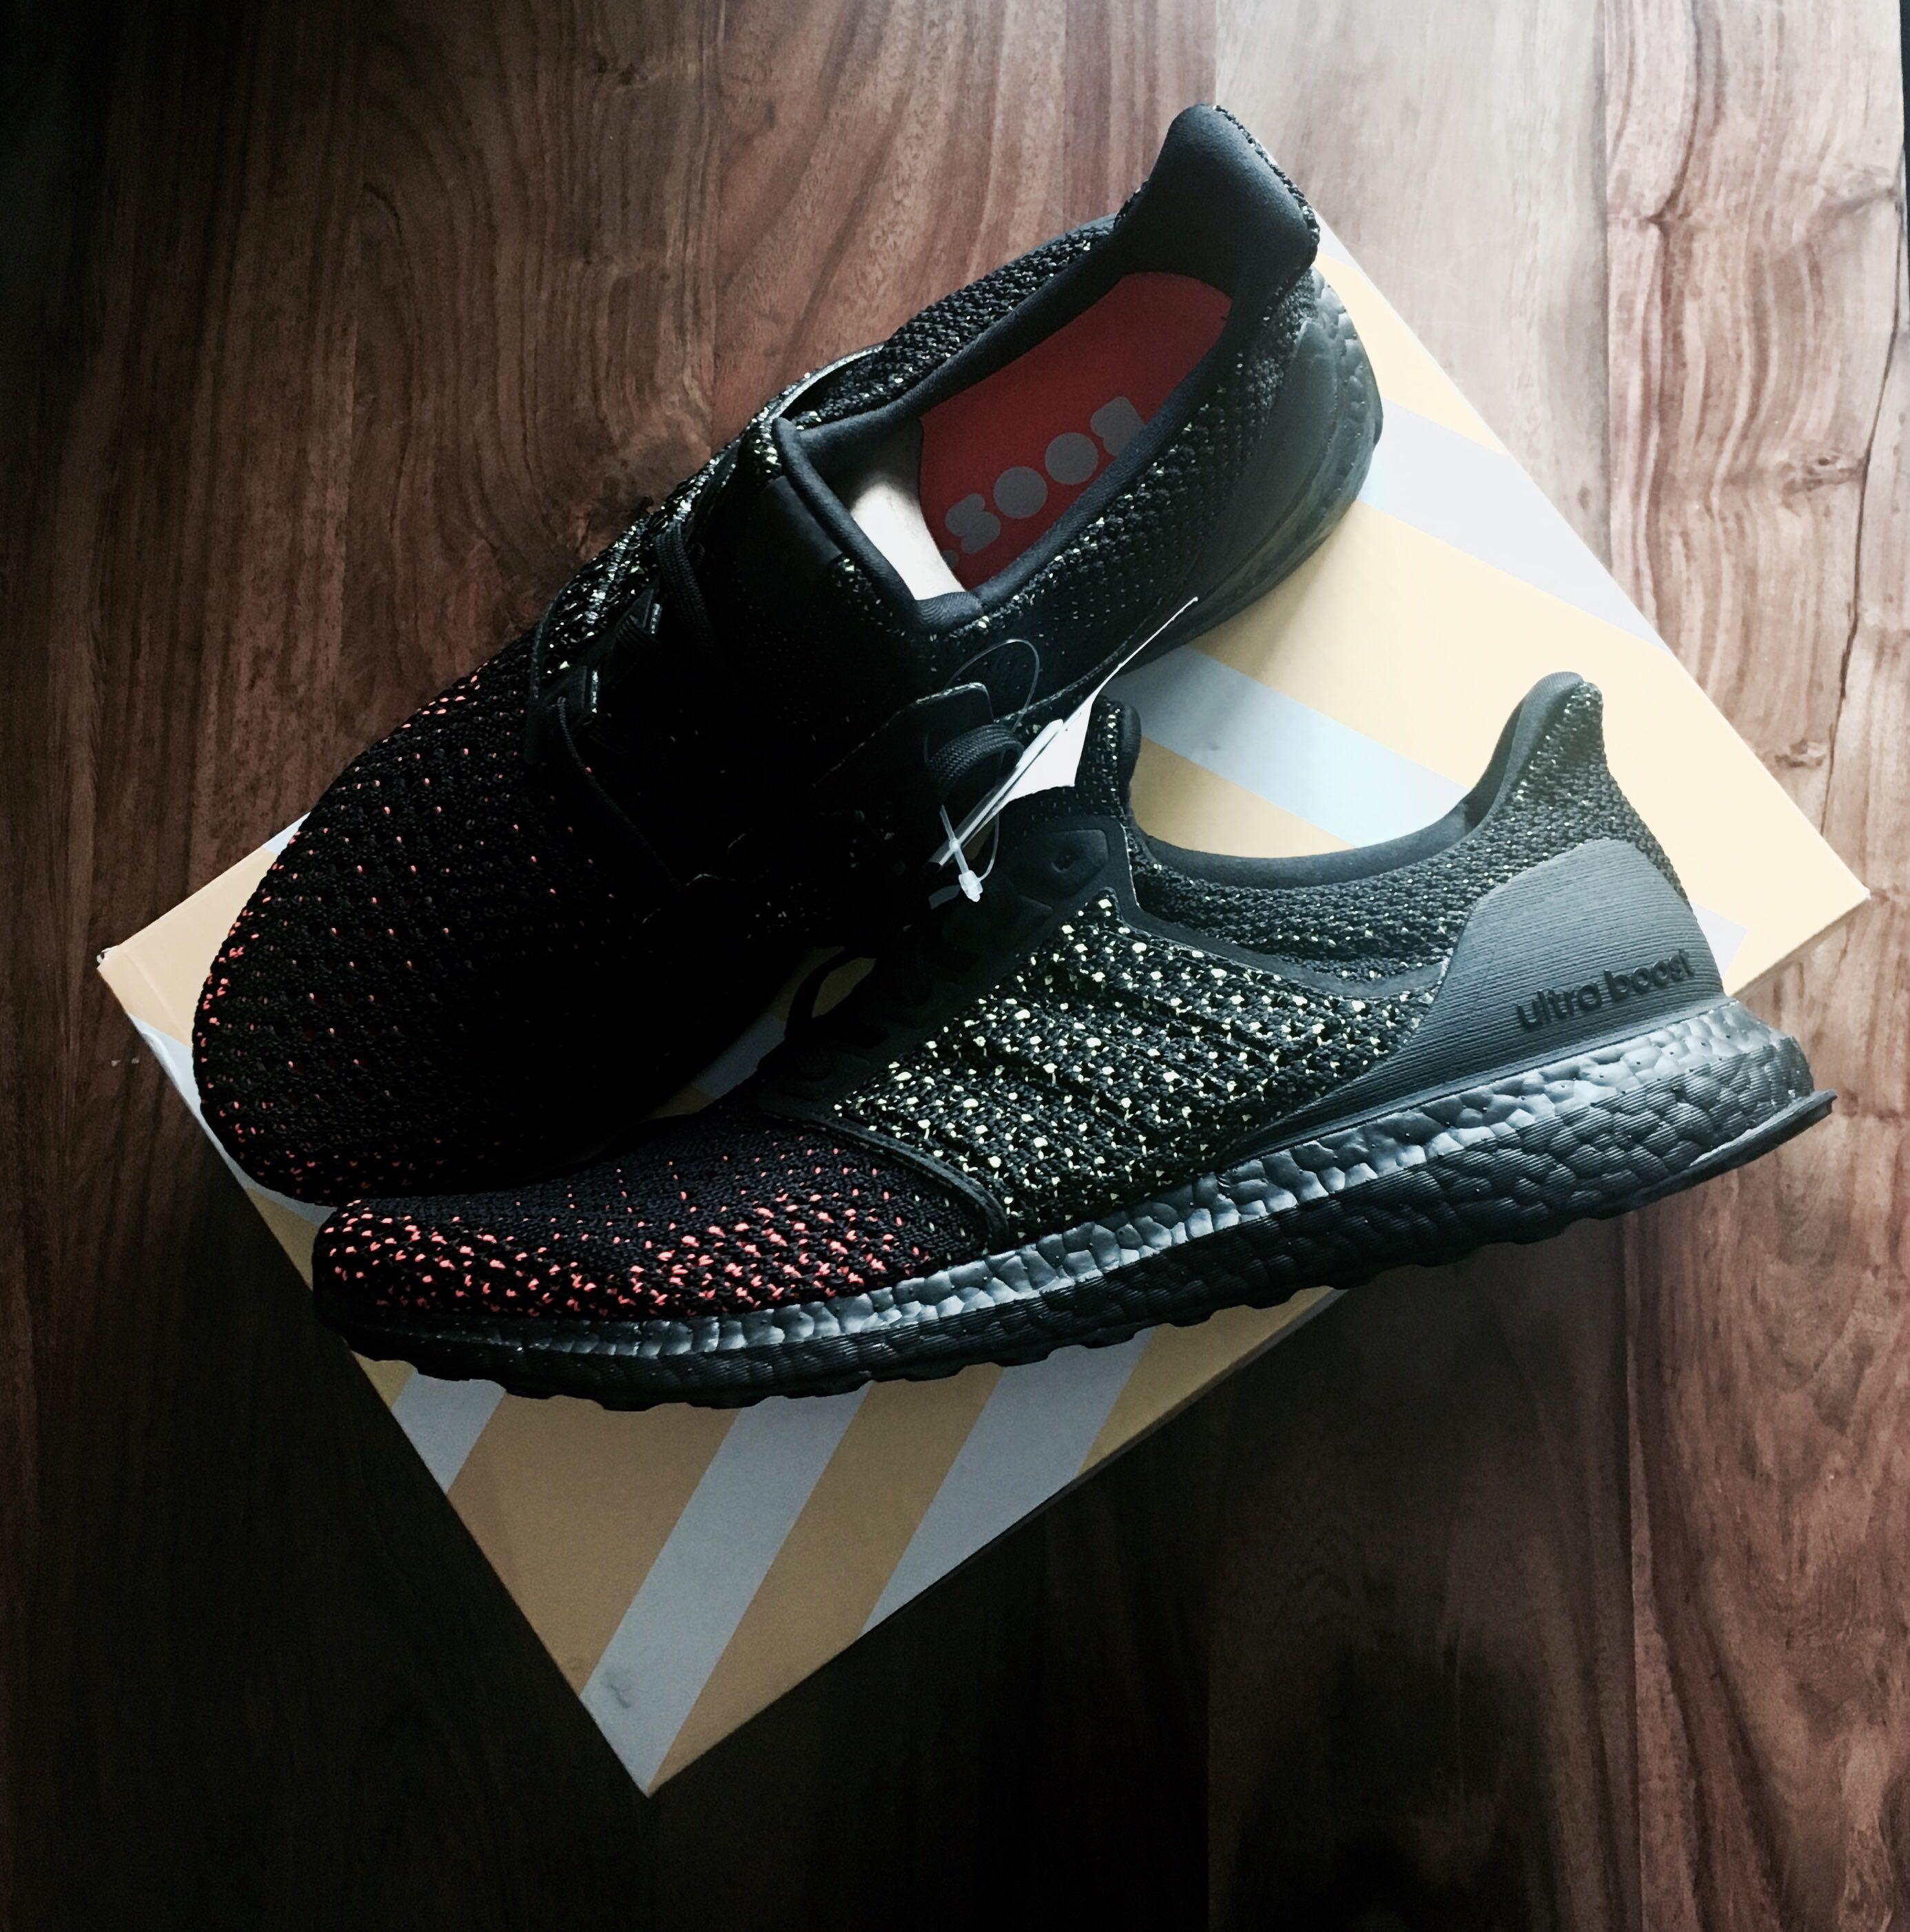 7f6b48775 ... new zealand adidas ultra boost mens fashion footwear sneakers on  carousell 9431f f050c